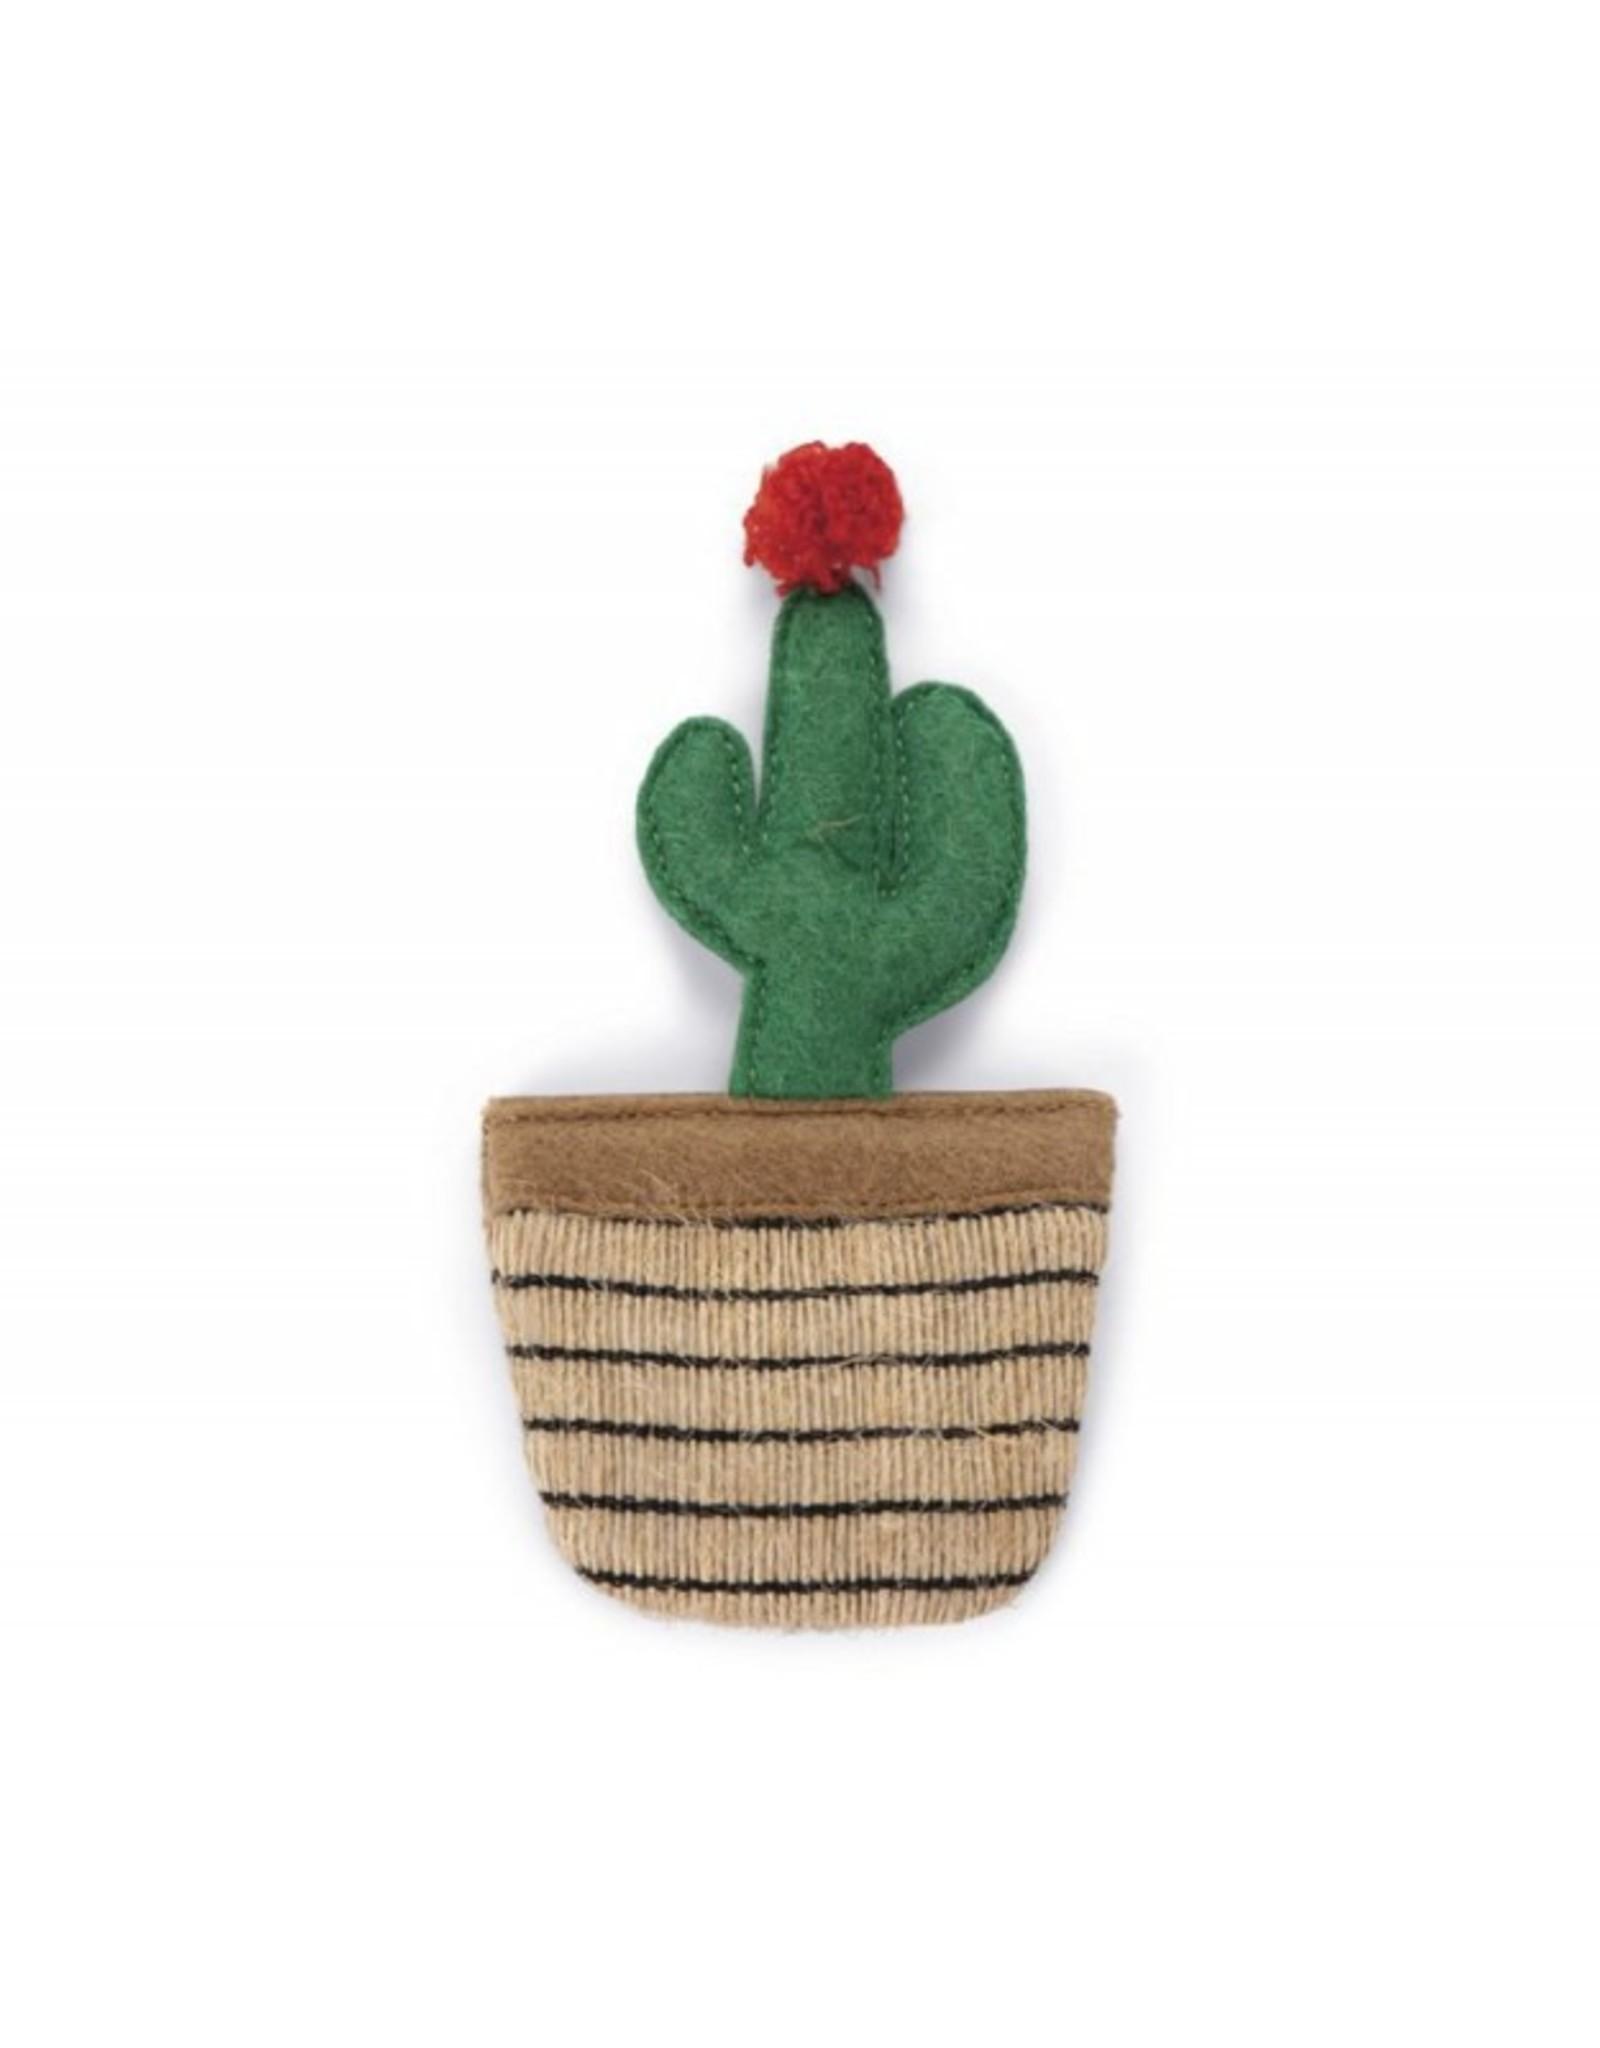 Beeztees Beeztees Catnip Cactus Ota -speeltje